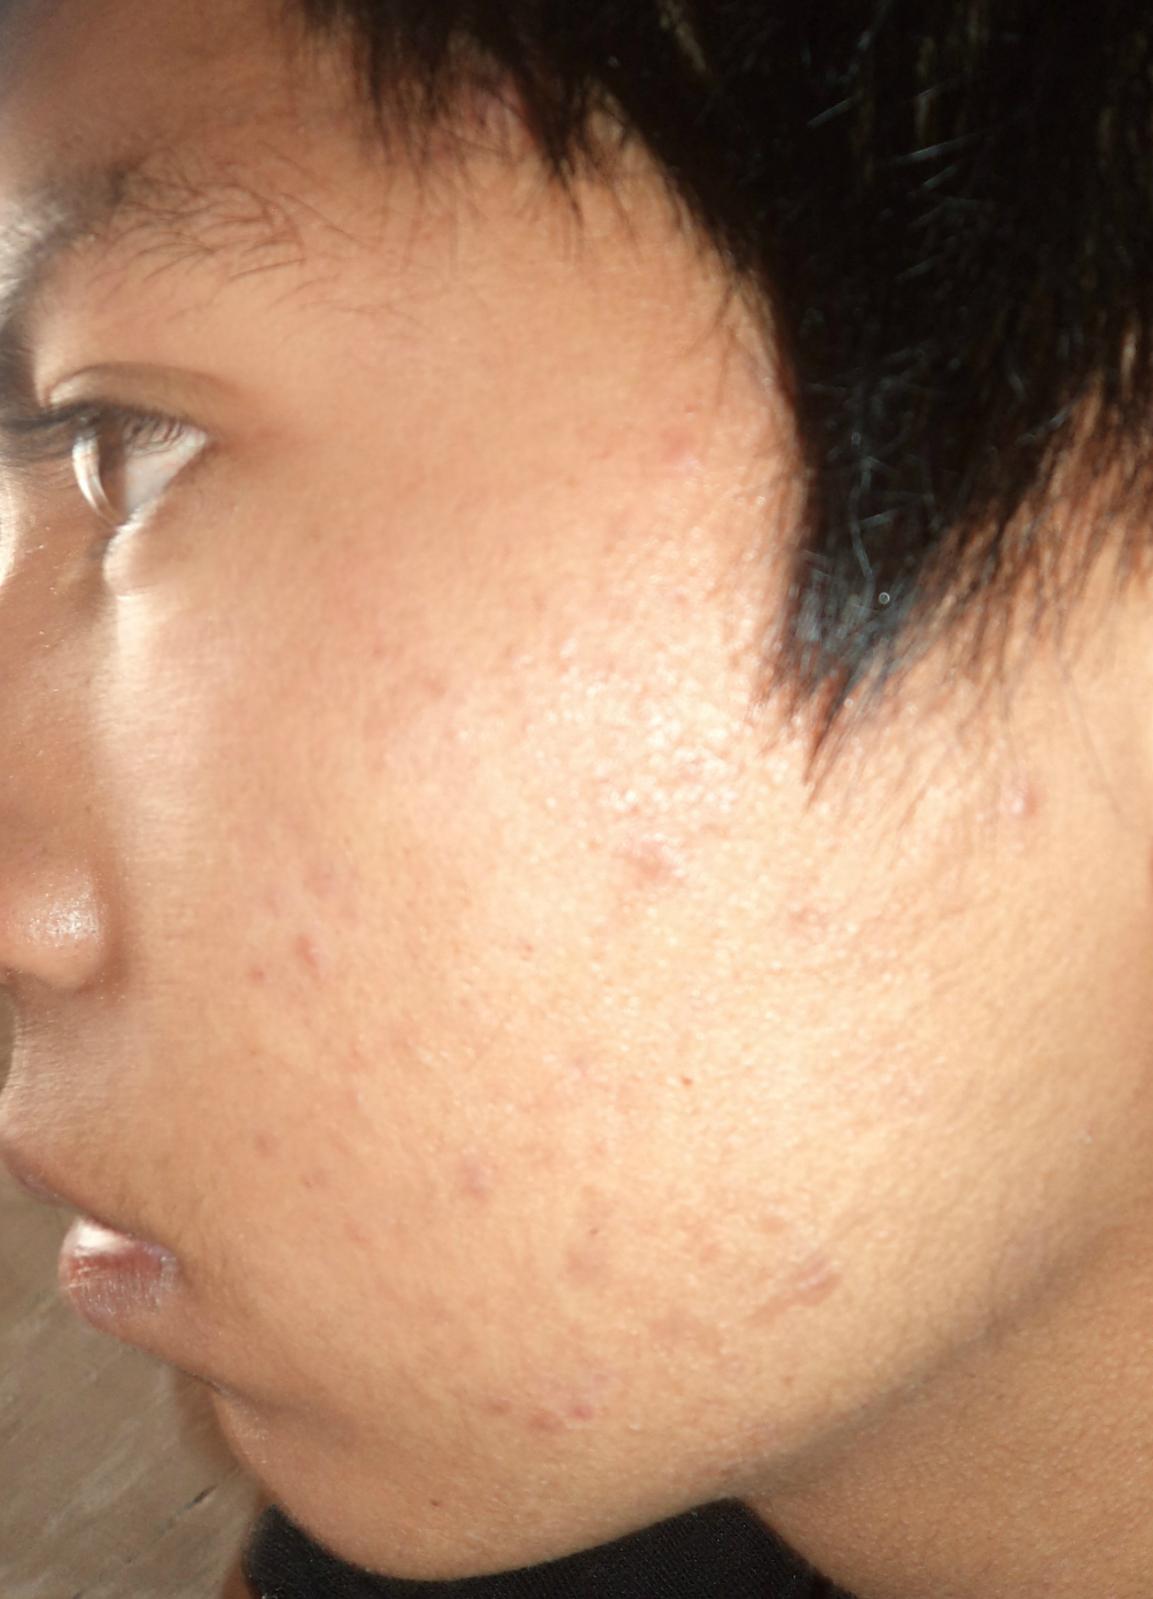 Tratamiento con Acnotin 20mg/dìa 2r61820